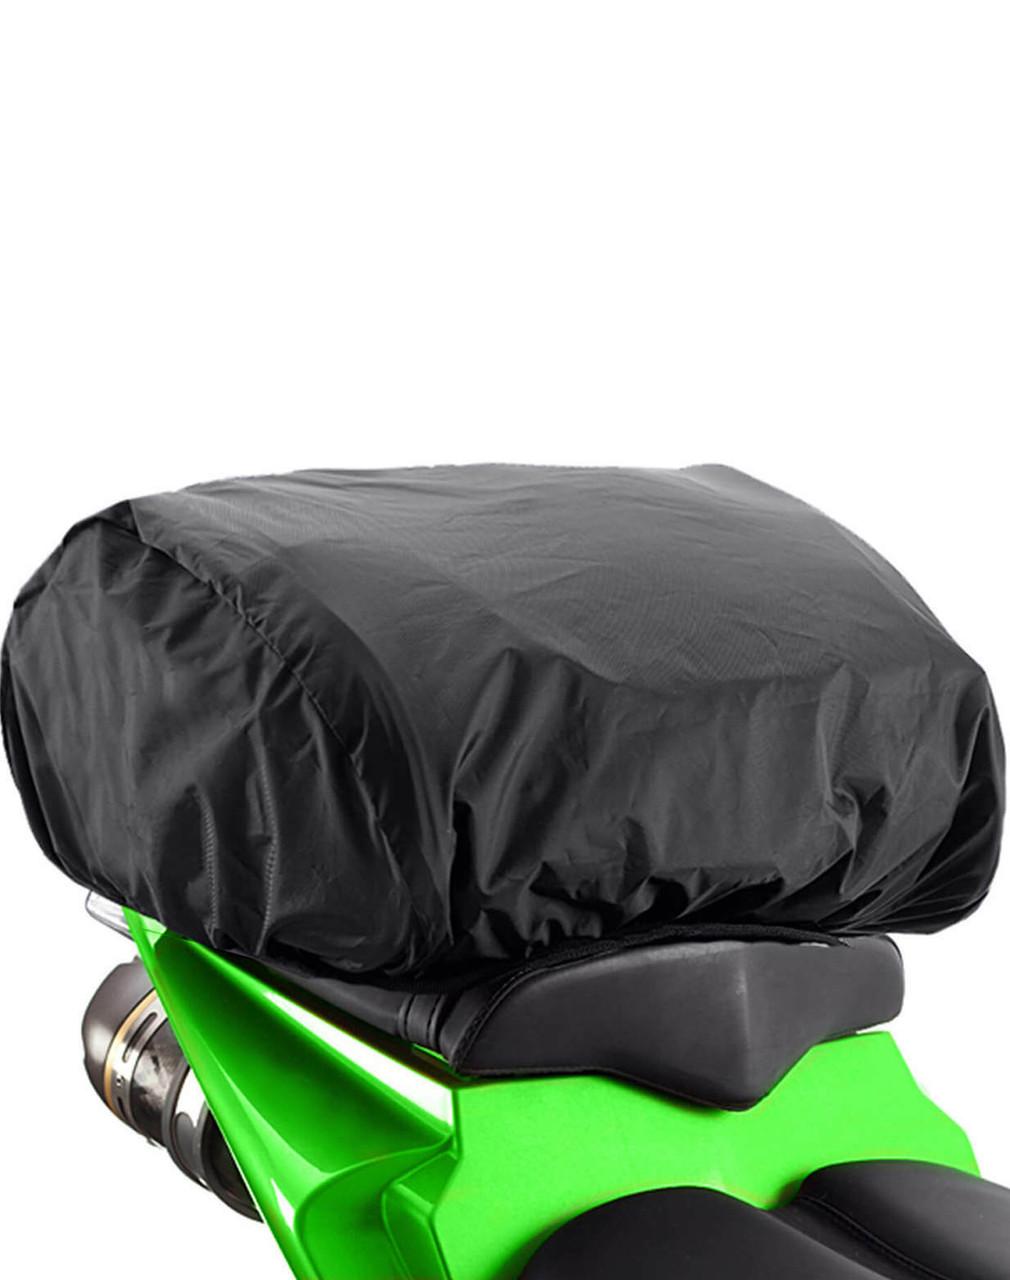 VikingBags Large Motorcycle Tail Bag For Harley Davidson Rain Cover